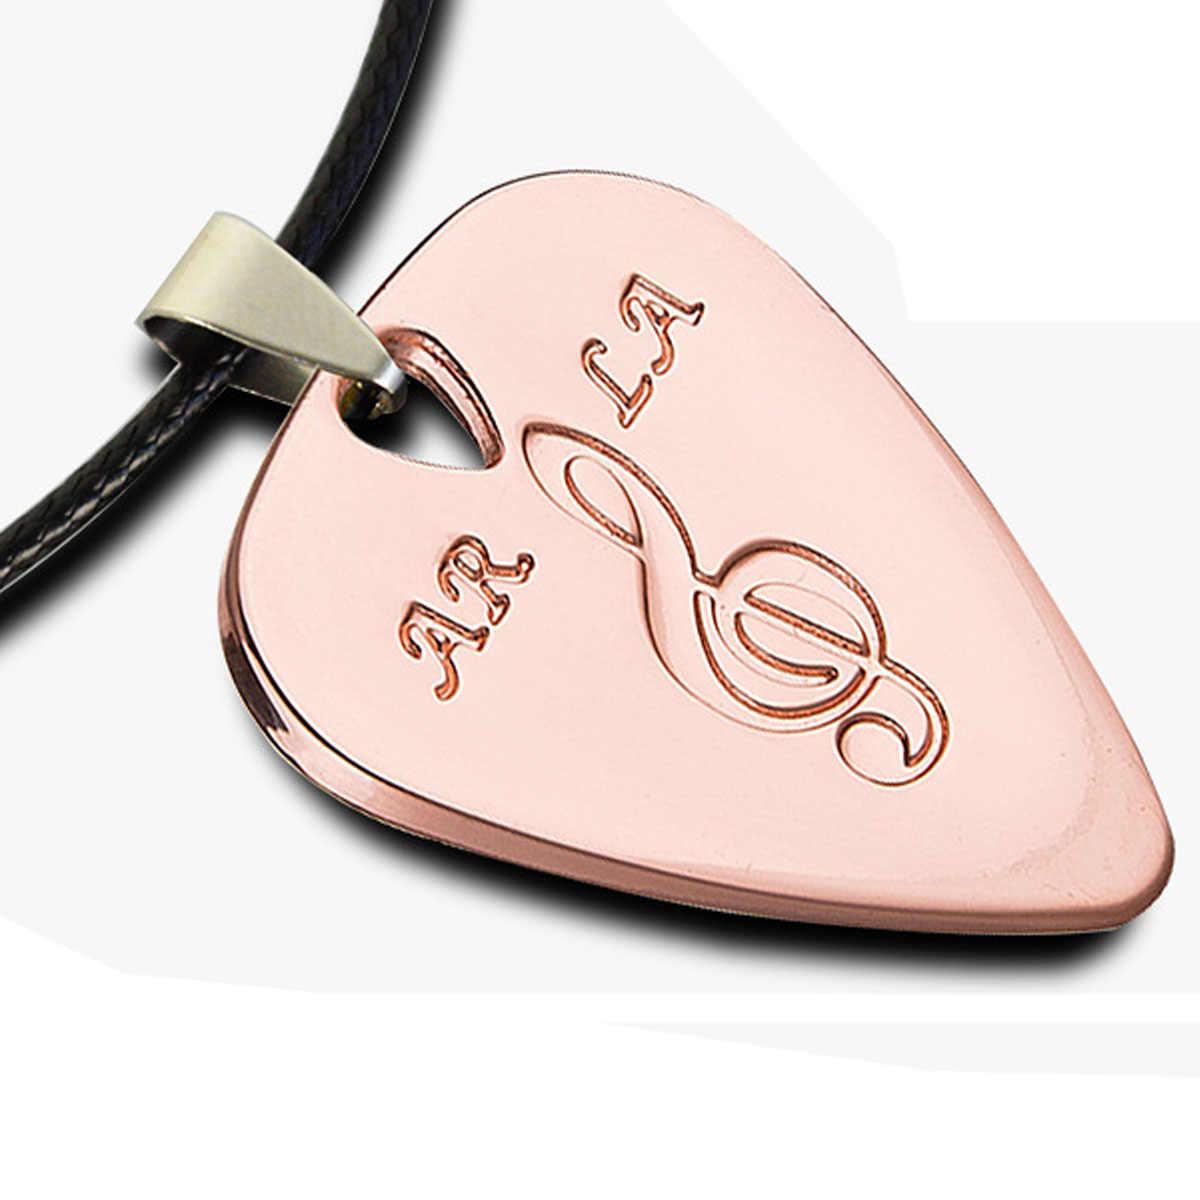 1 Pcs מתכת גיטרה פיק 0.38mm דק עמיד כסף צבע מקצועי בס Ukelele גיטרה מבחר